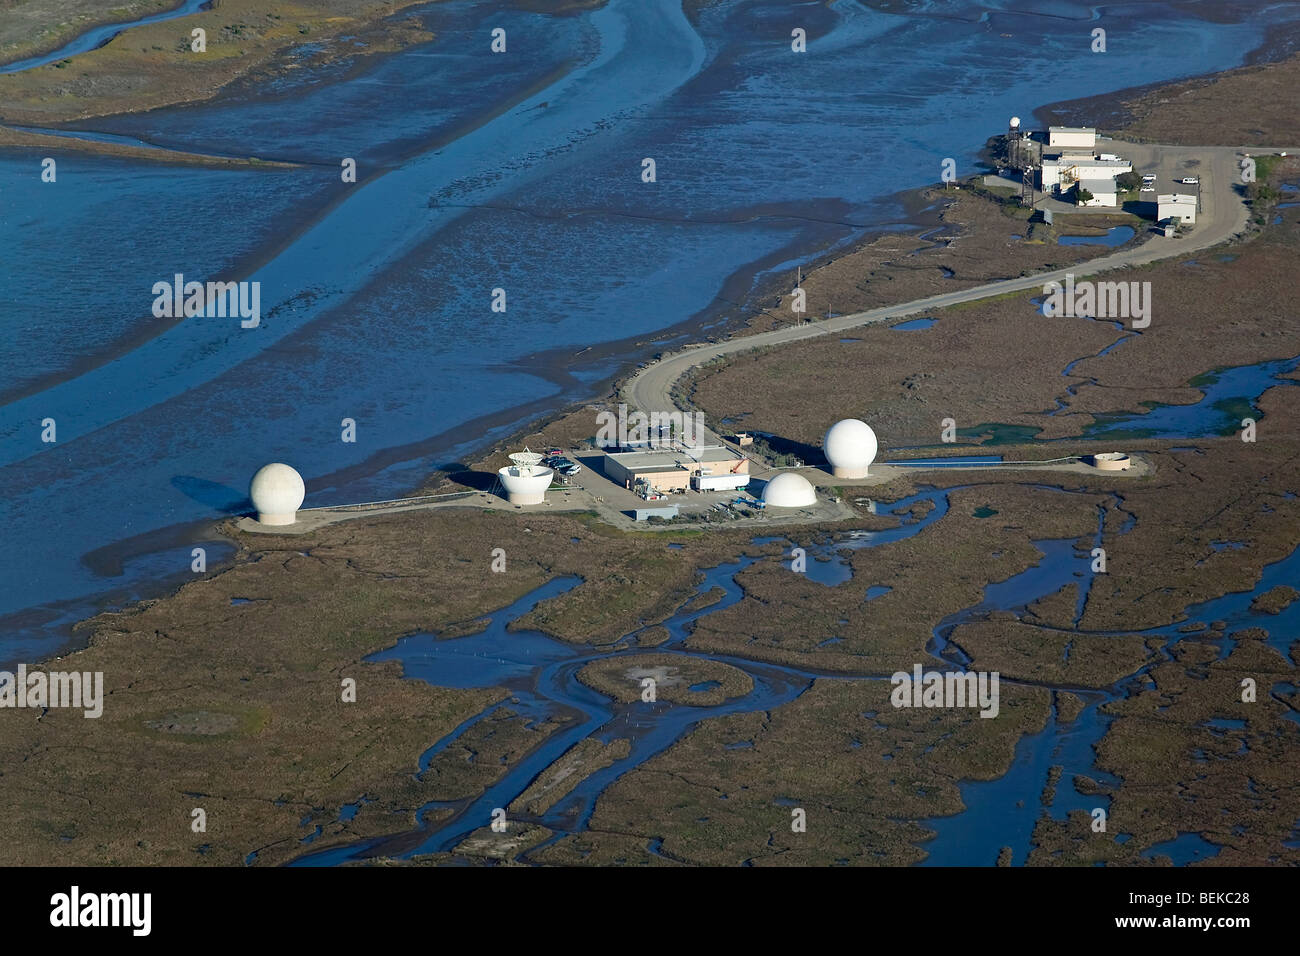 aerial view above Radar Reflectivity Laboratory Point Mugu Naval Air Station California - Stock Image